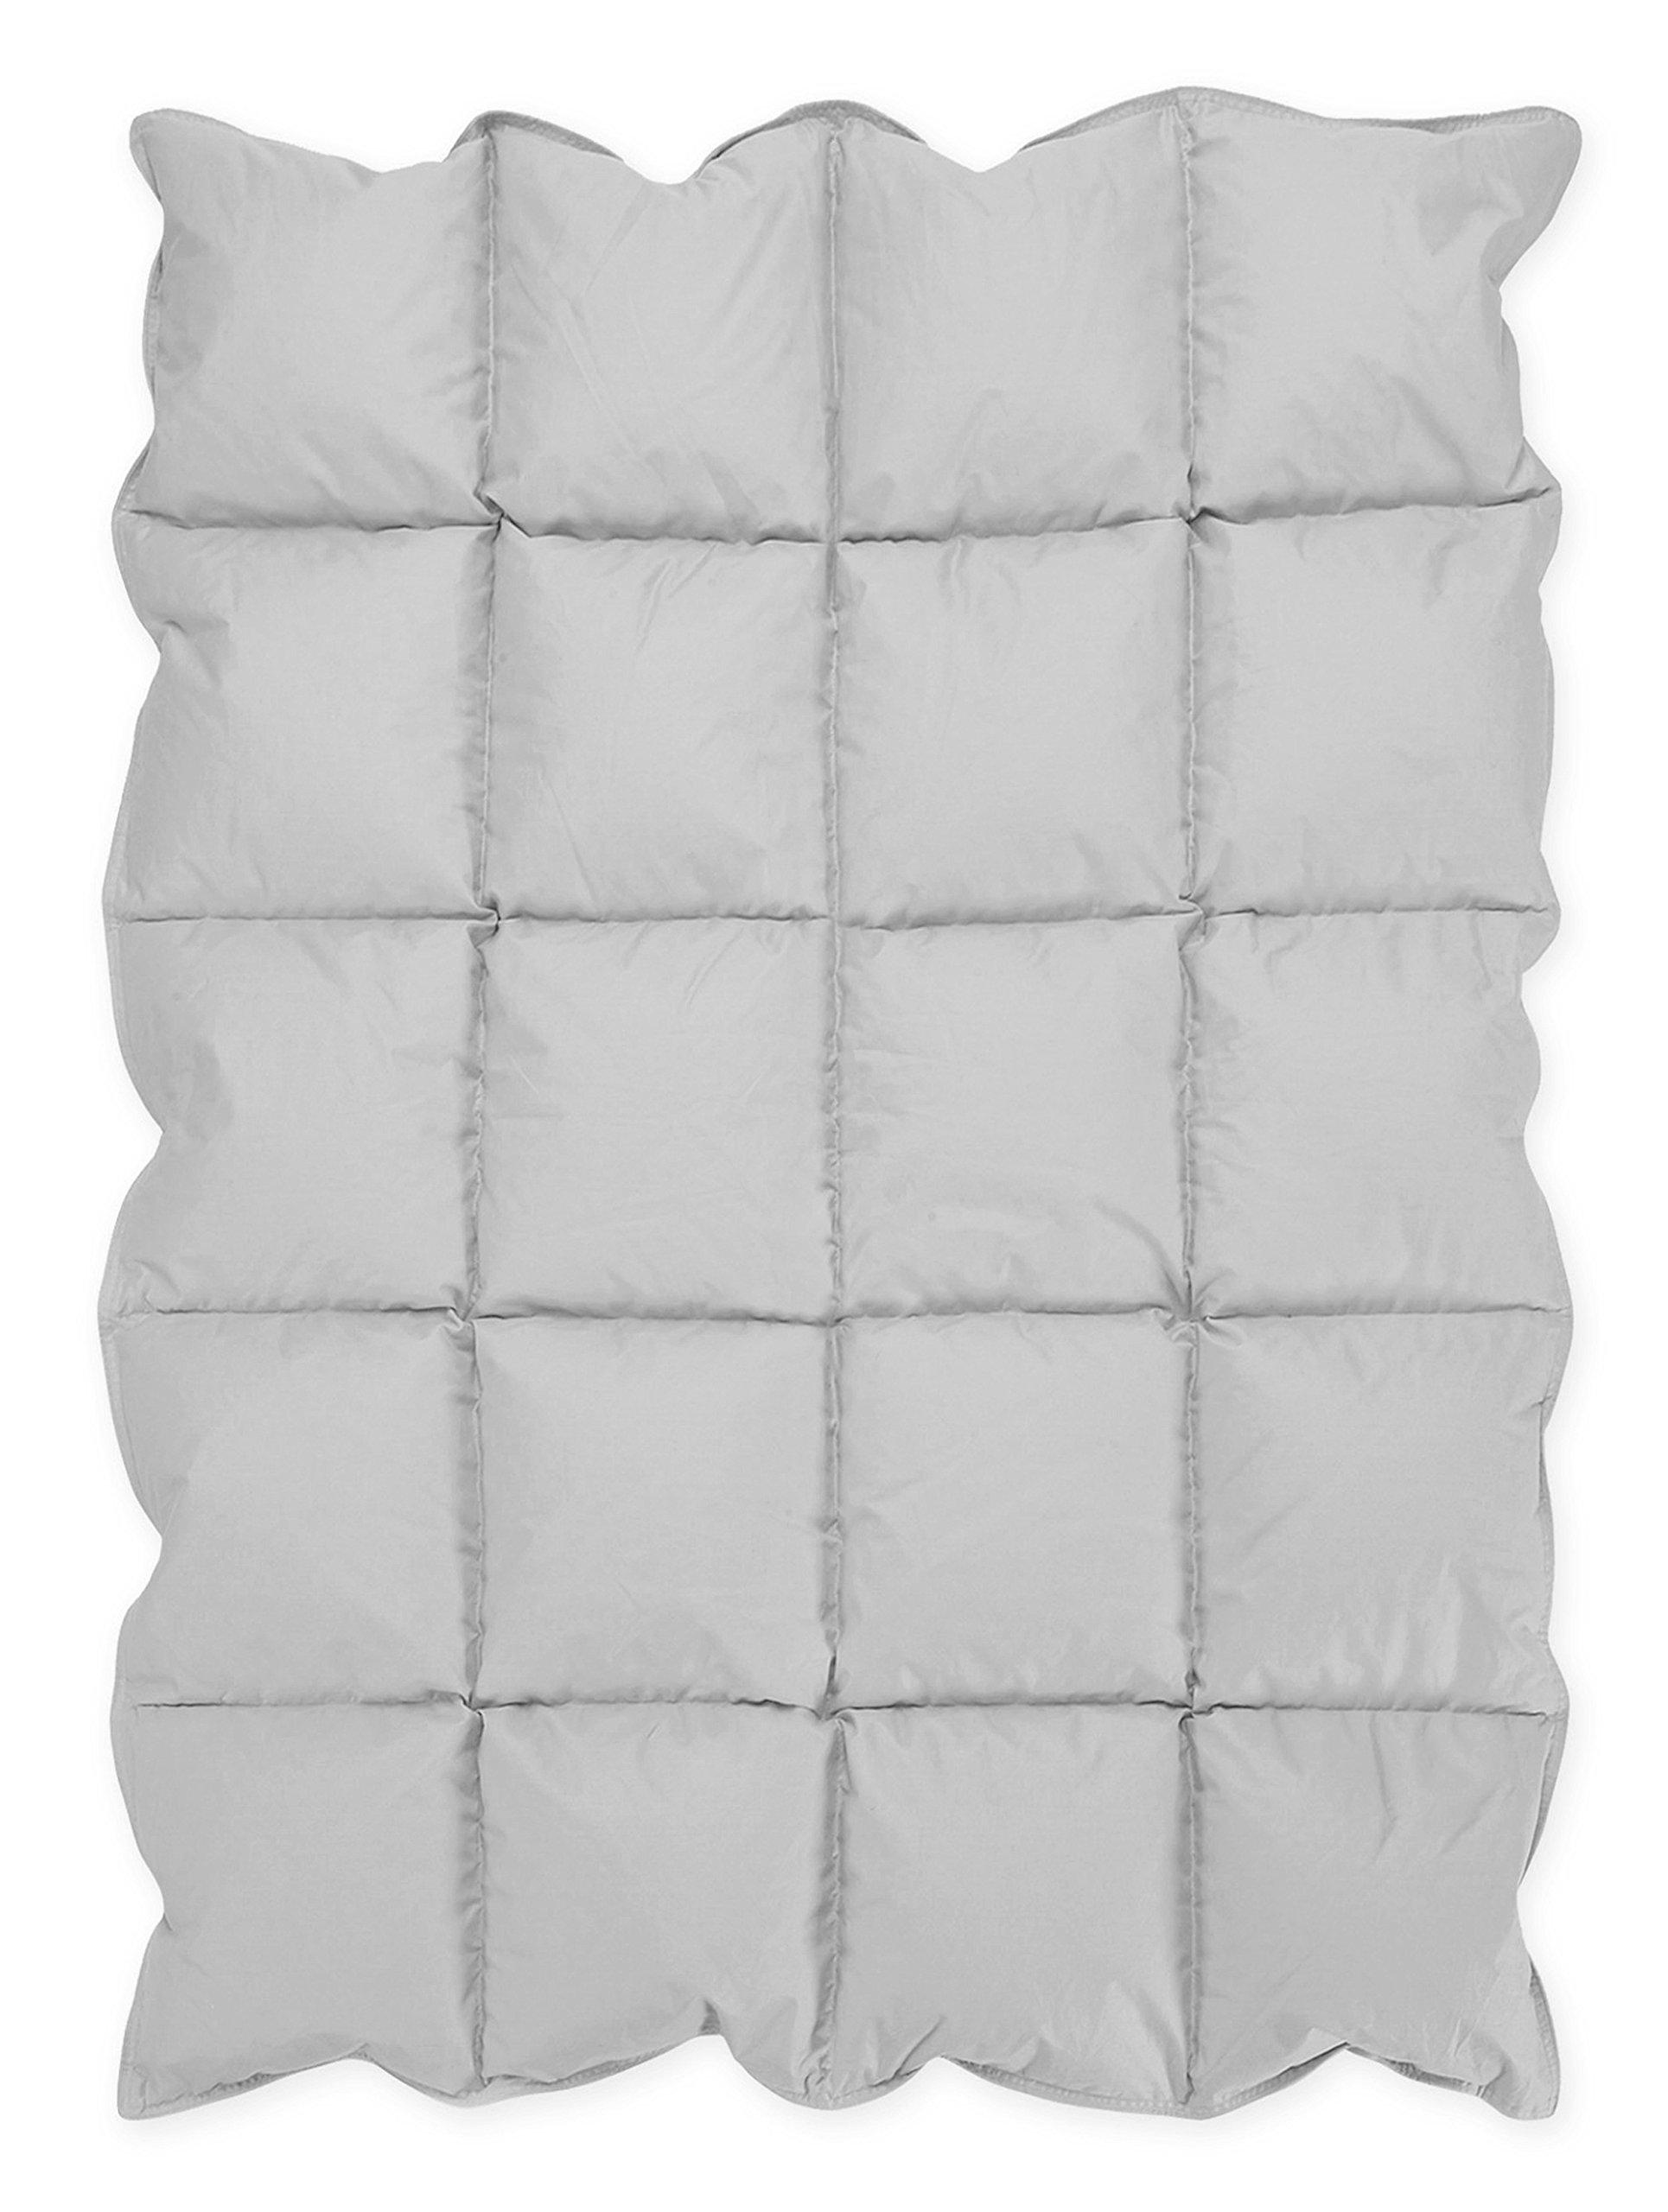 Gray Baby Down Alternative Comforter/Blanket for Crib Bedding